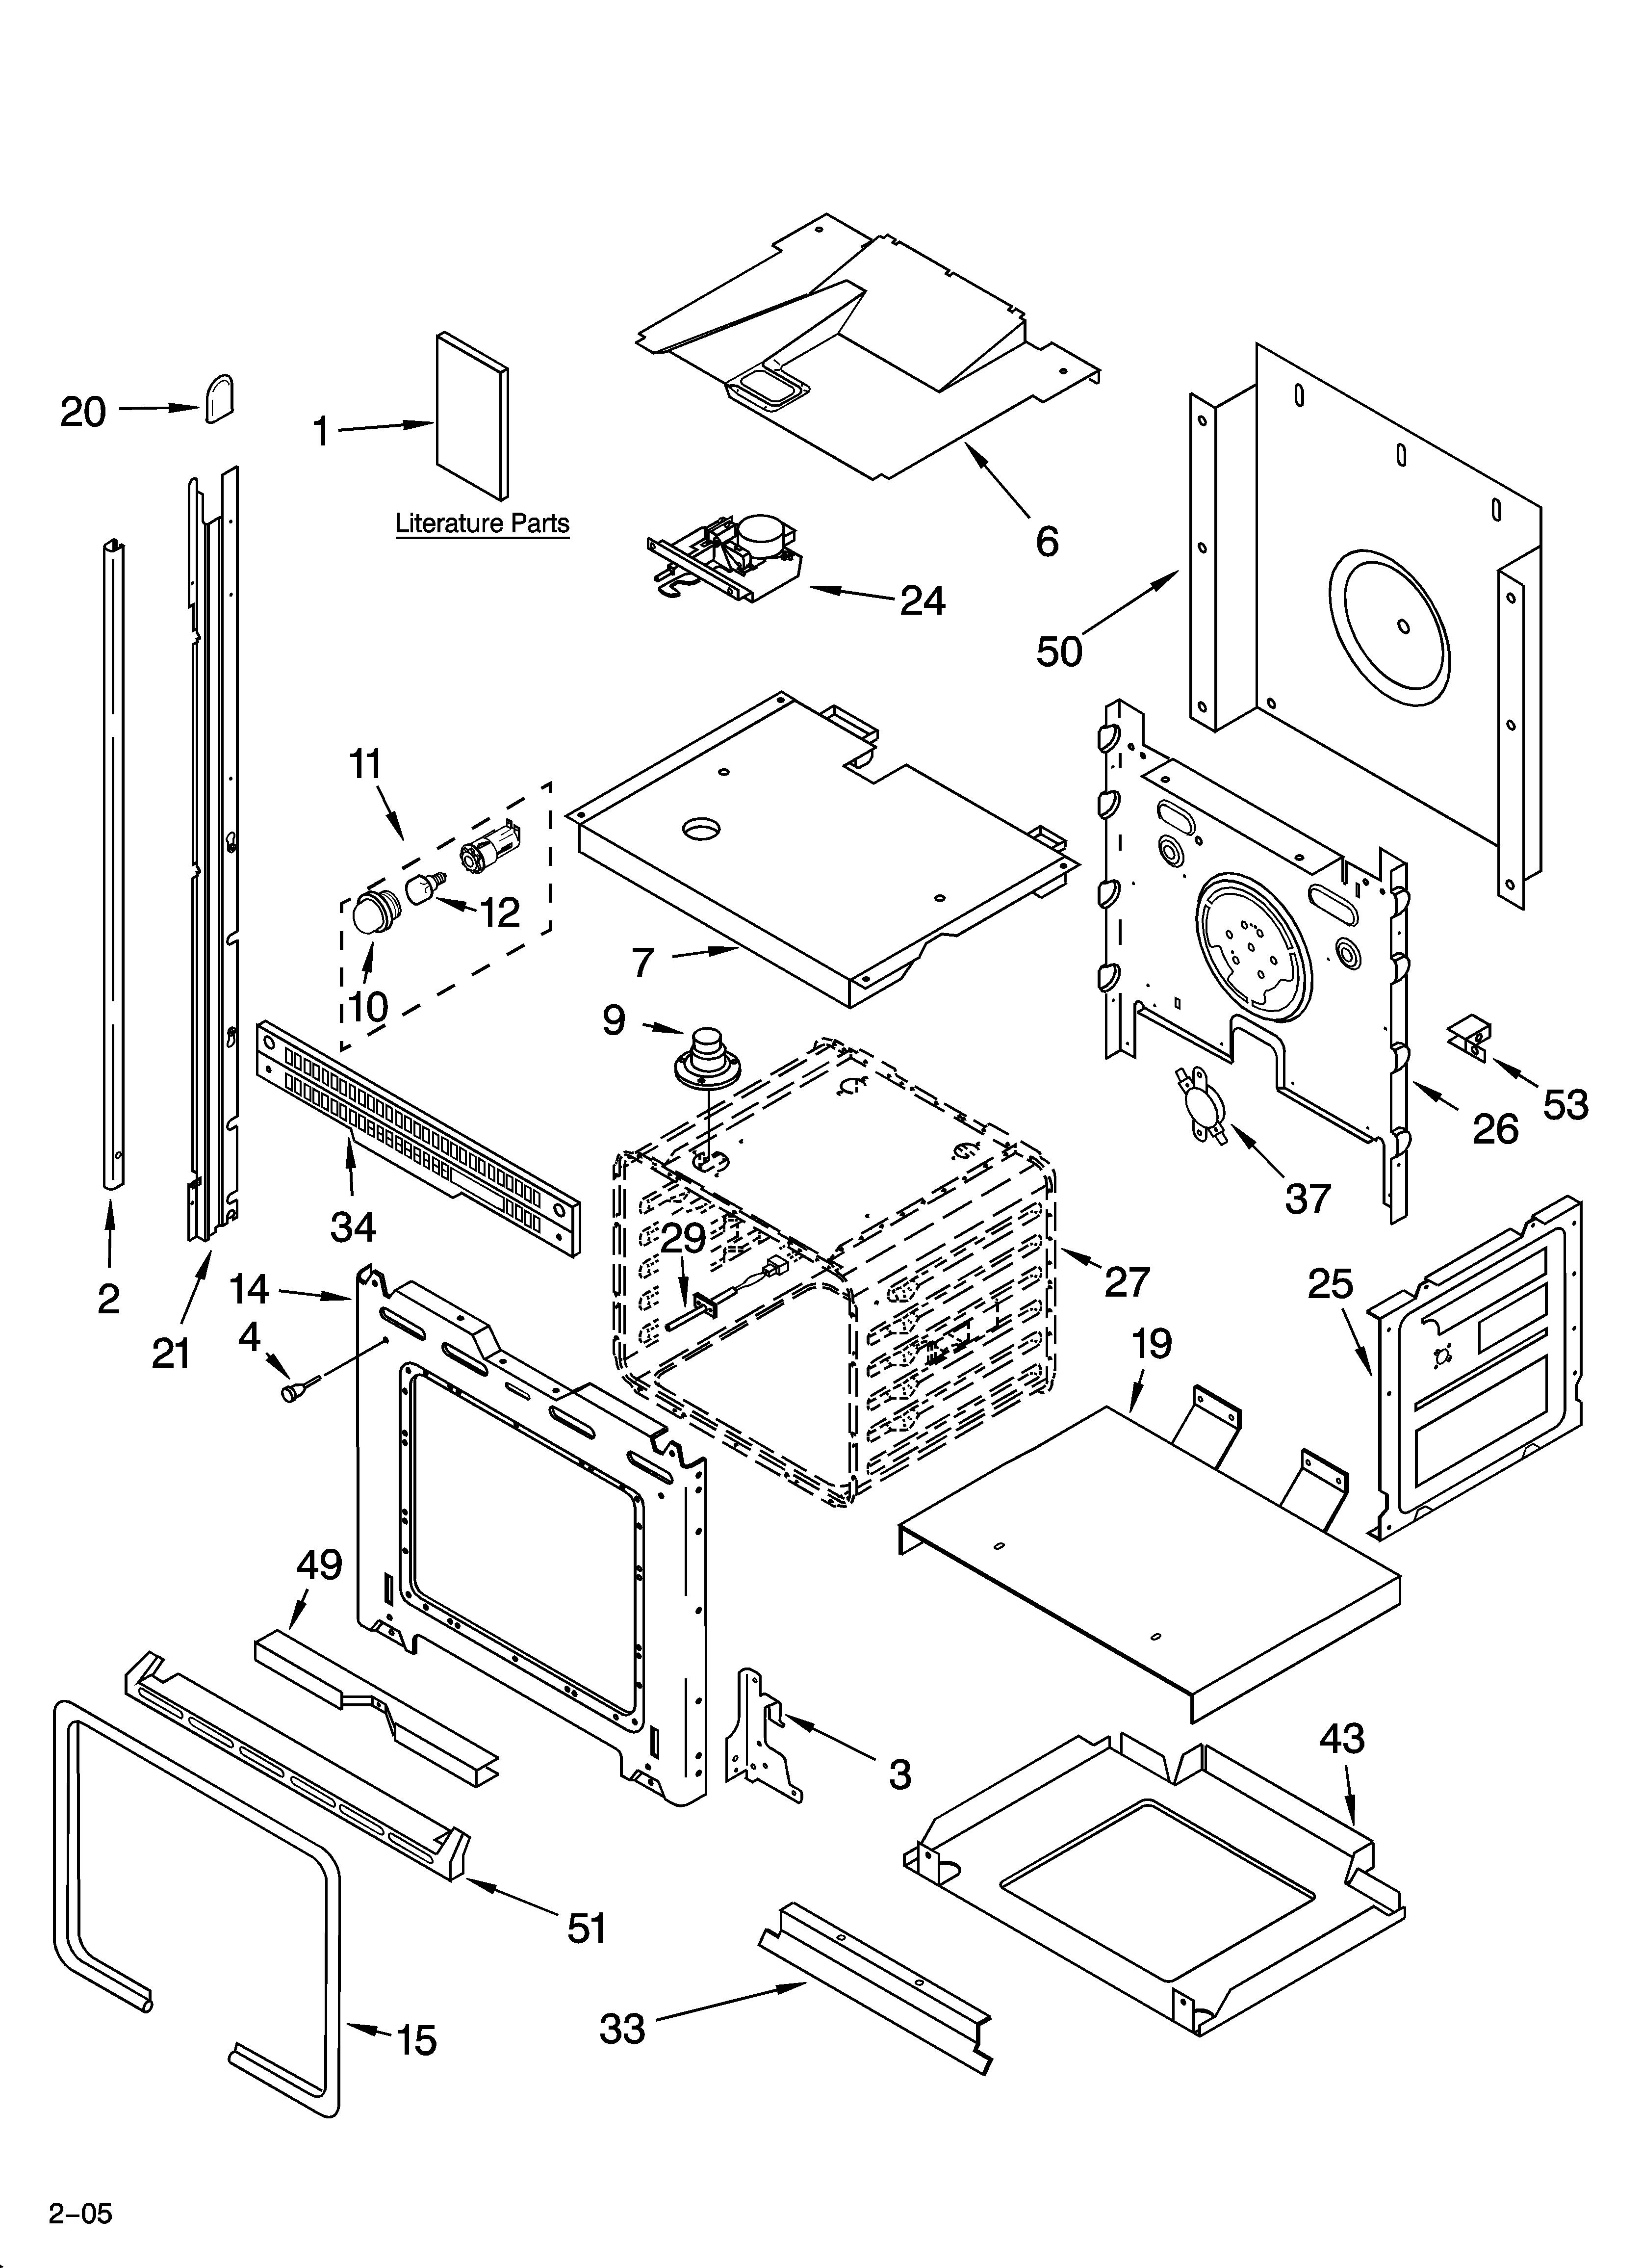 Enjoyable Whirlpool Double Oven Wiring Diagram Wiring Diagram Wiring Cloud Hisonepsysticxongrecoveryedborg